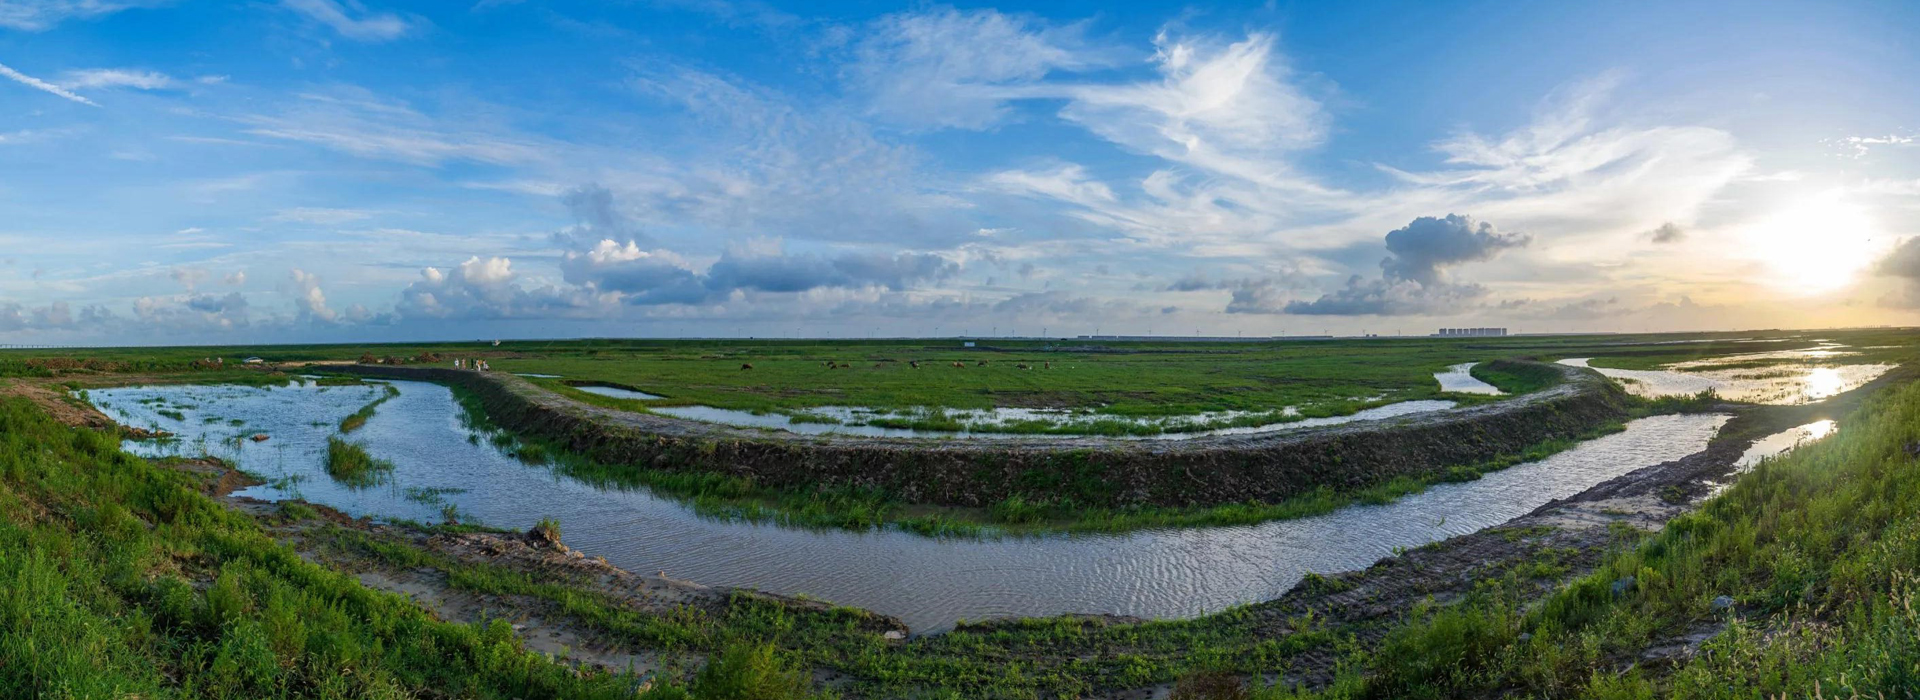 Photographers, visitors enjoy poetic grassland of Qidong